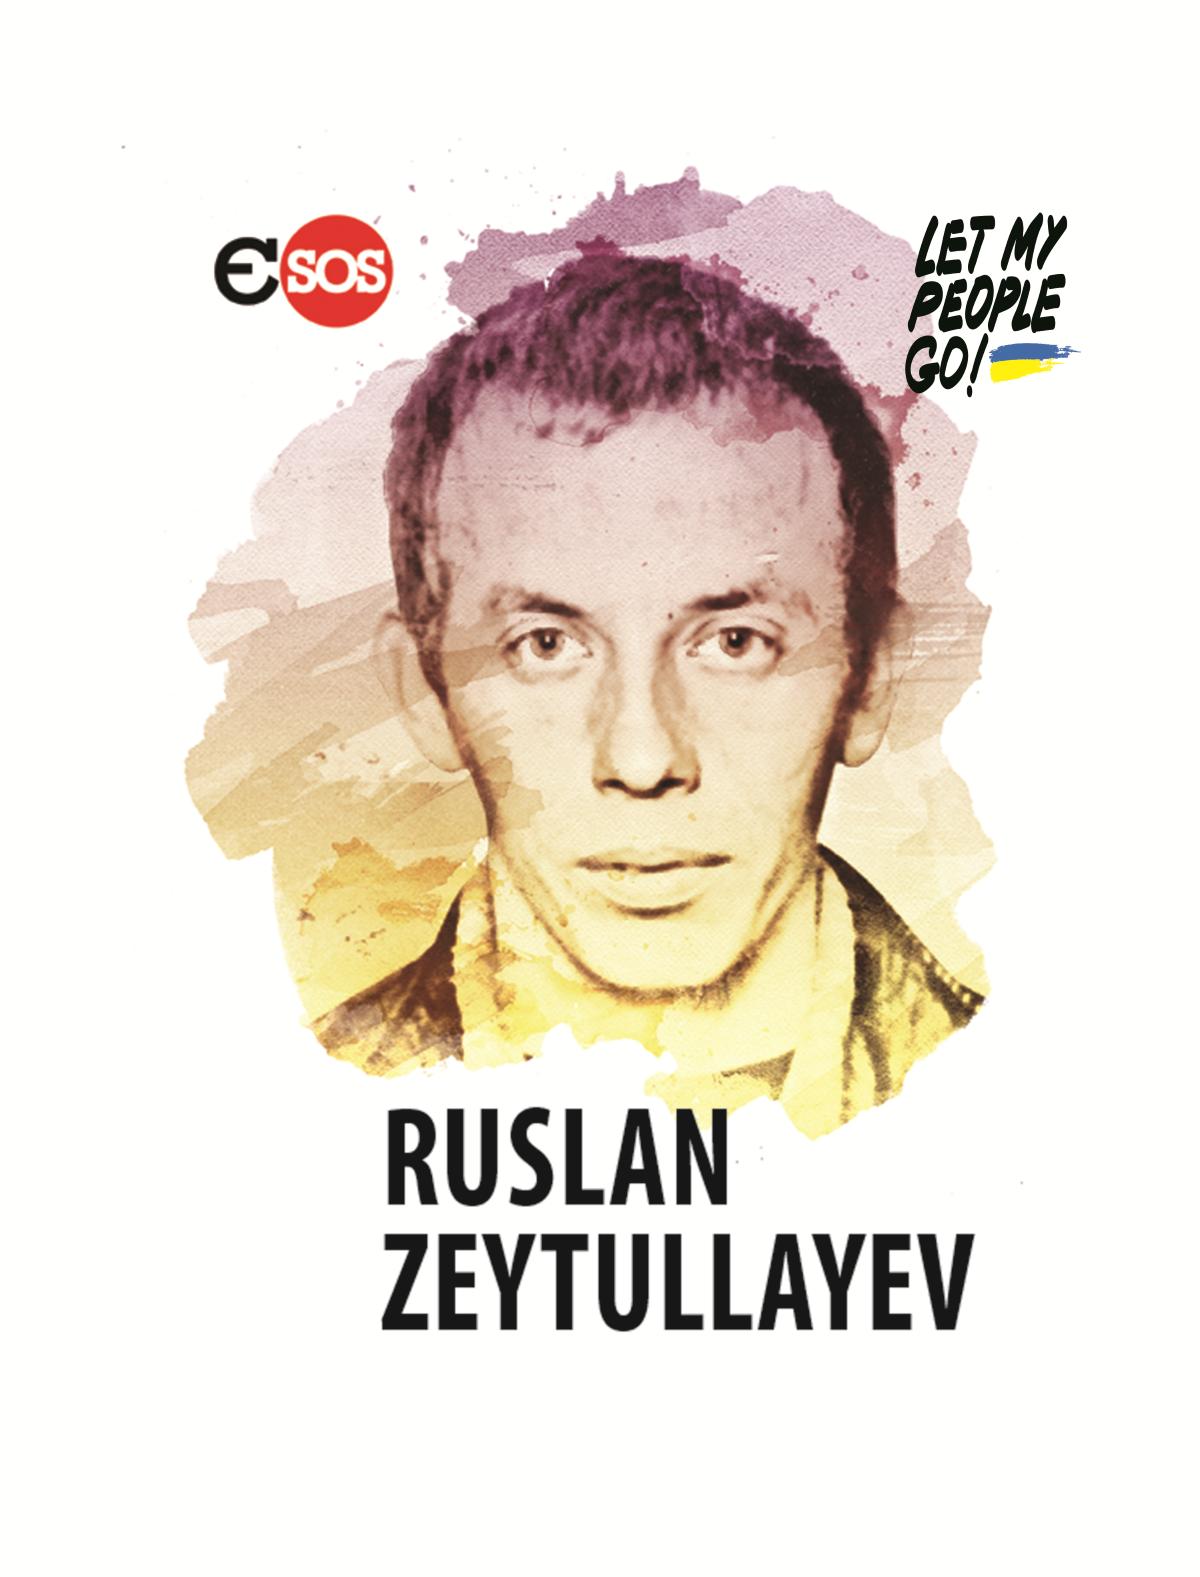 Zeitoulaiev